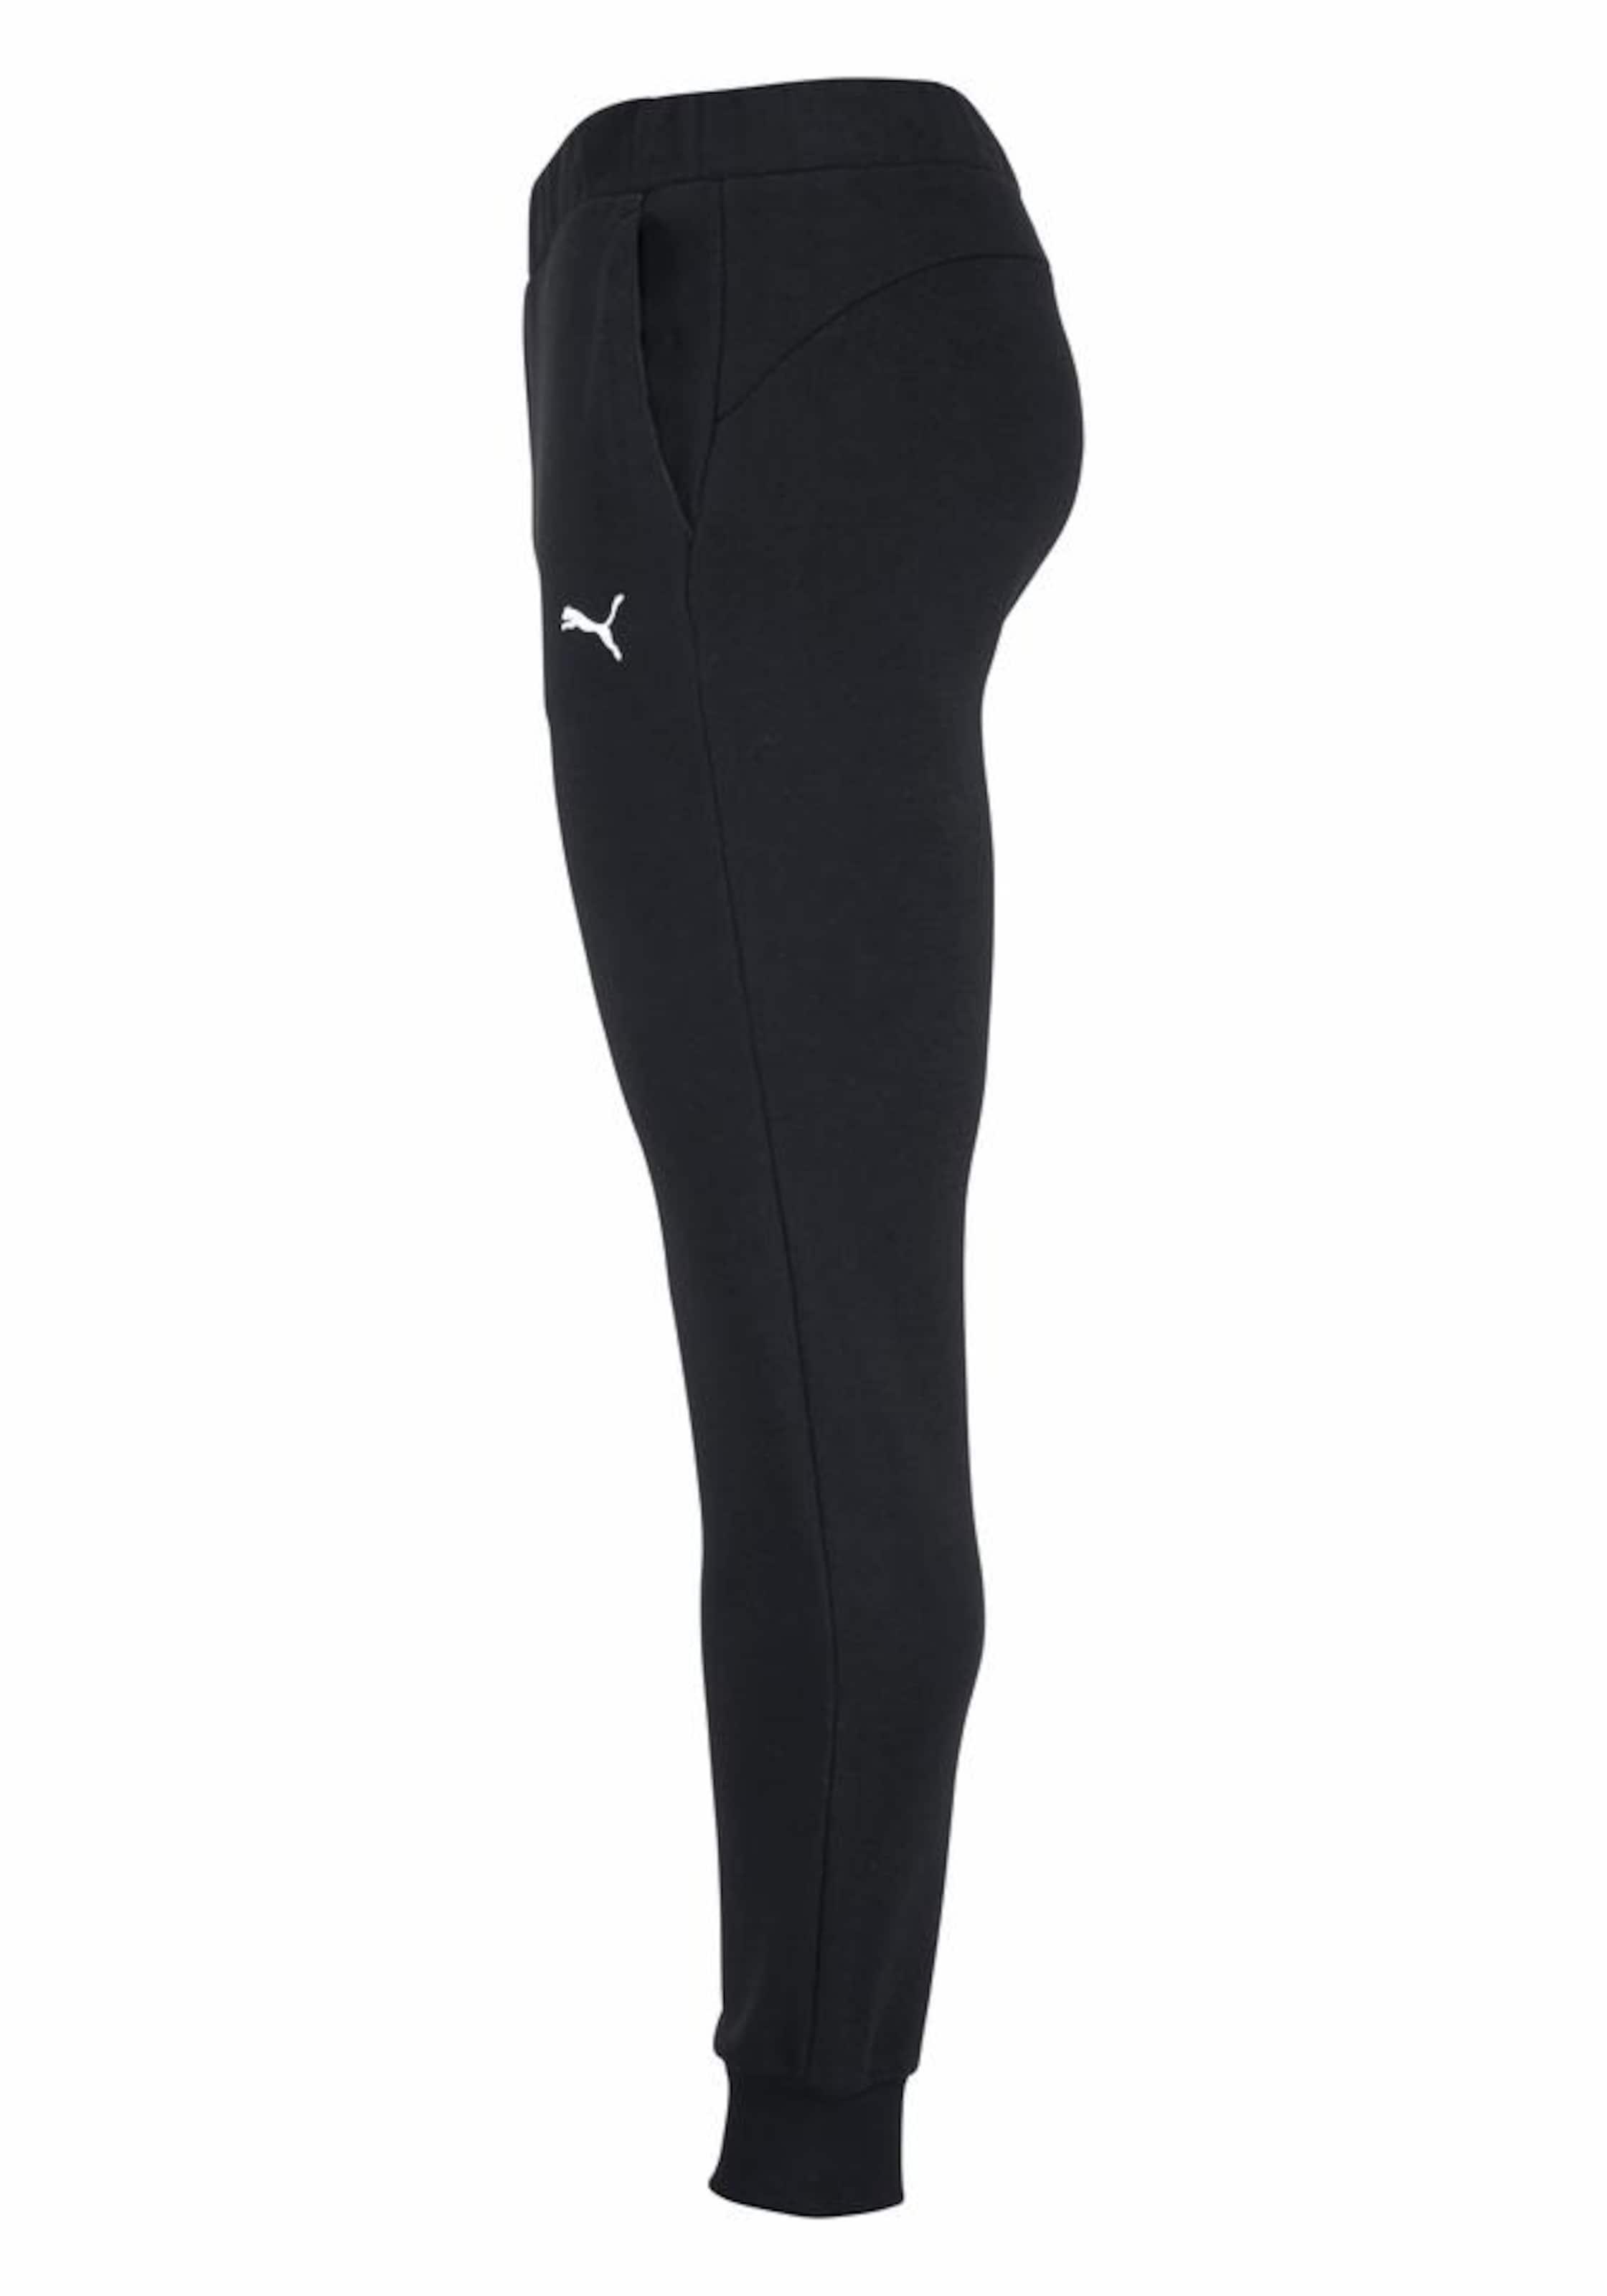 Billigste Online PUMA Jogginghose 'ESS Sweat Pants' Rabatt 2018 Unisex Rabatt Empfehlen PN6yicoHmh